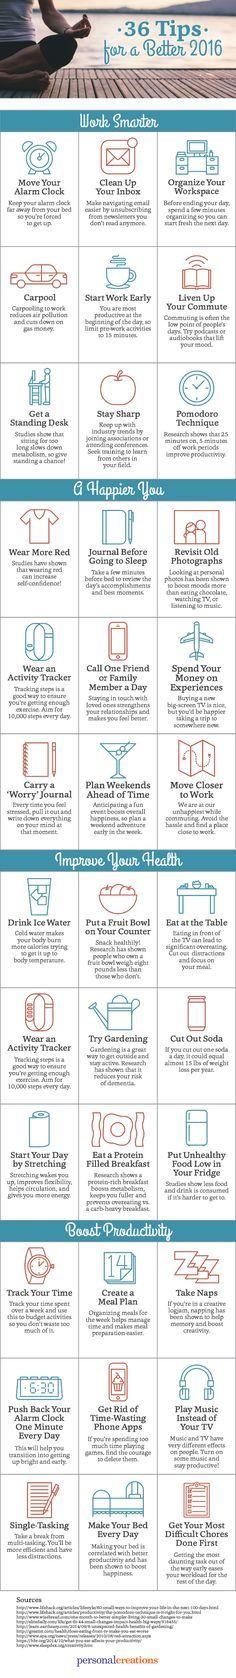 36 self-improvement tips for a better 2016